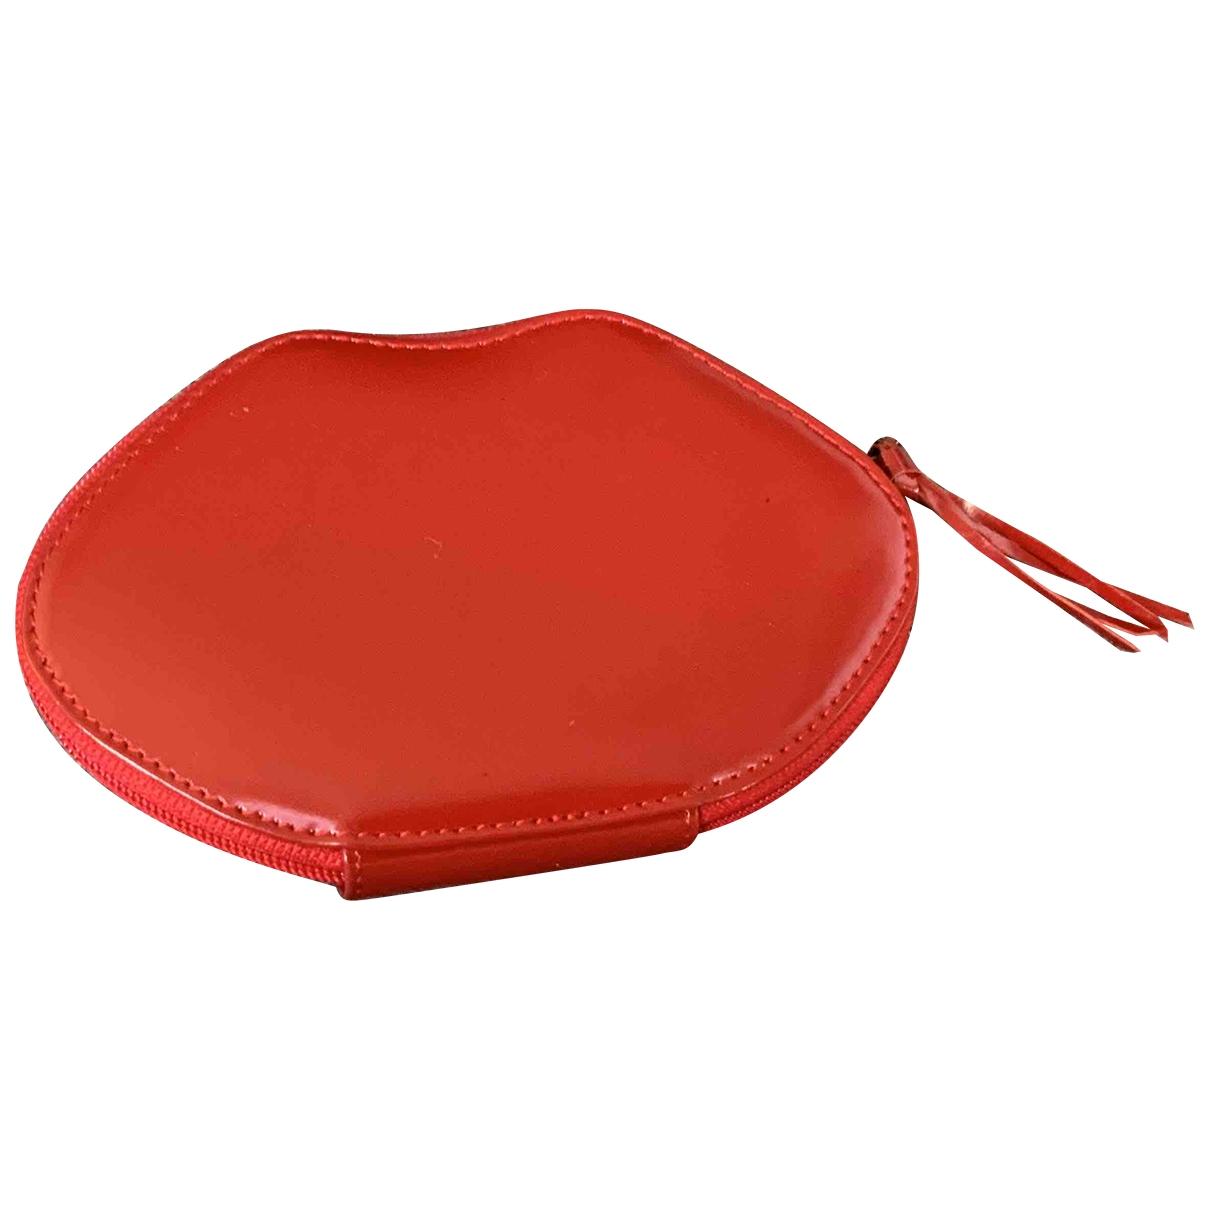 Sonia Rykiel \N Kleinlederwaren in  Rot Leder